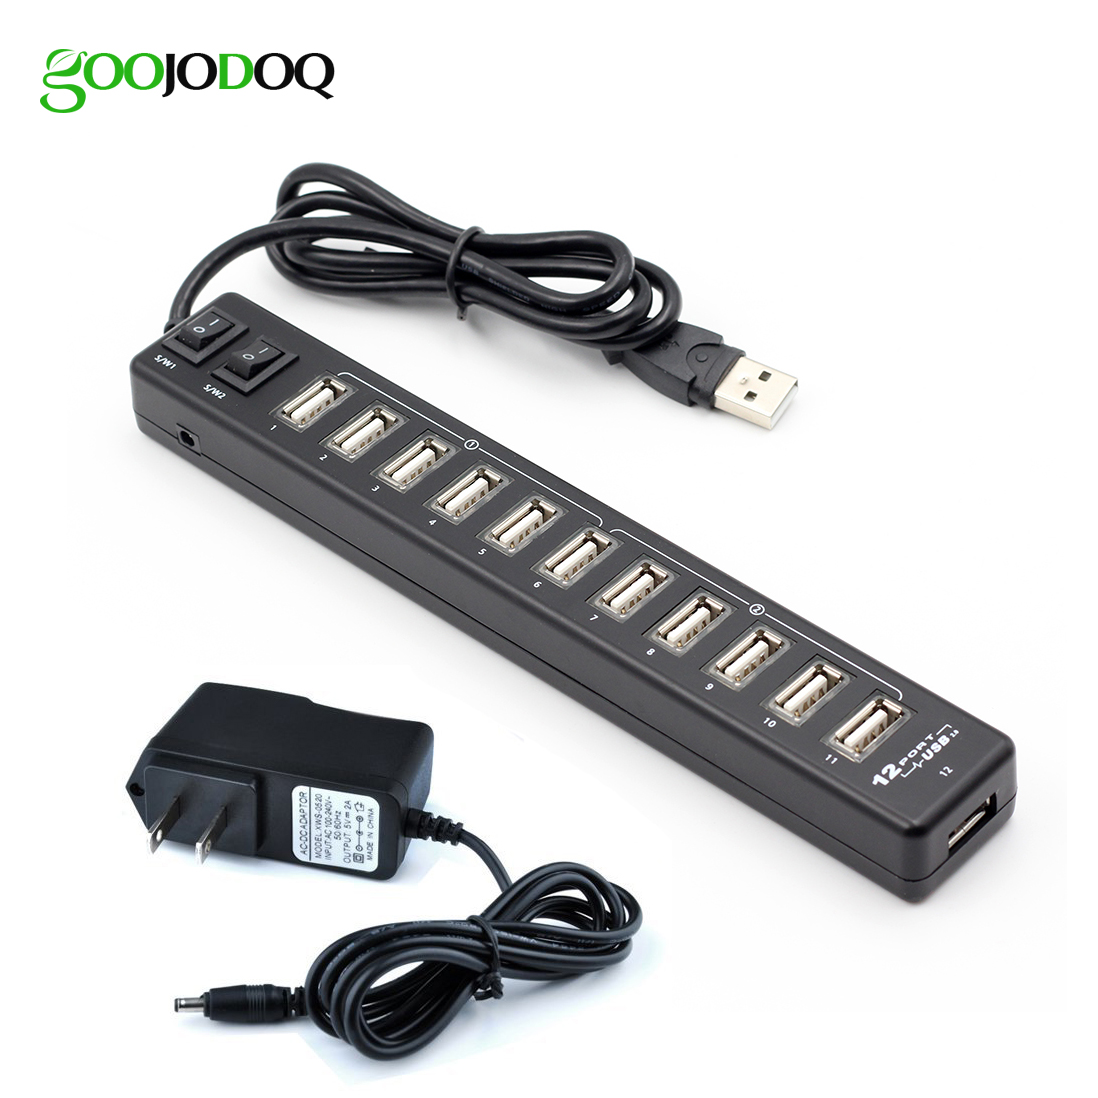 GOOJODOQ High quality 12 Ports USB 2.0 Hub With 2 switch ...